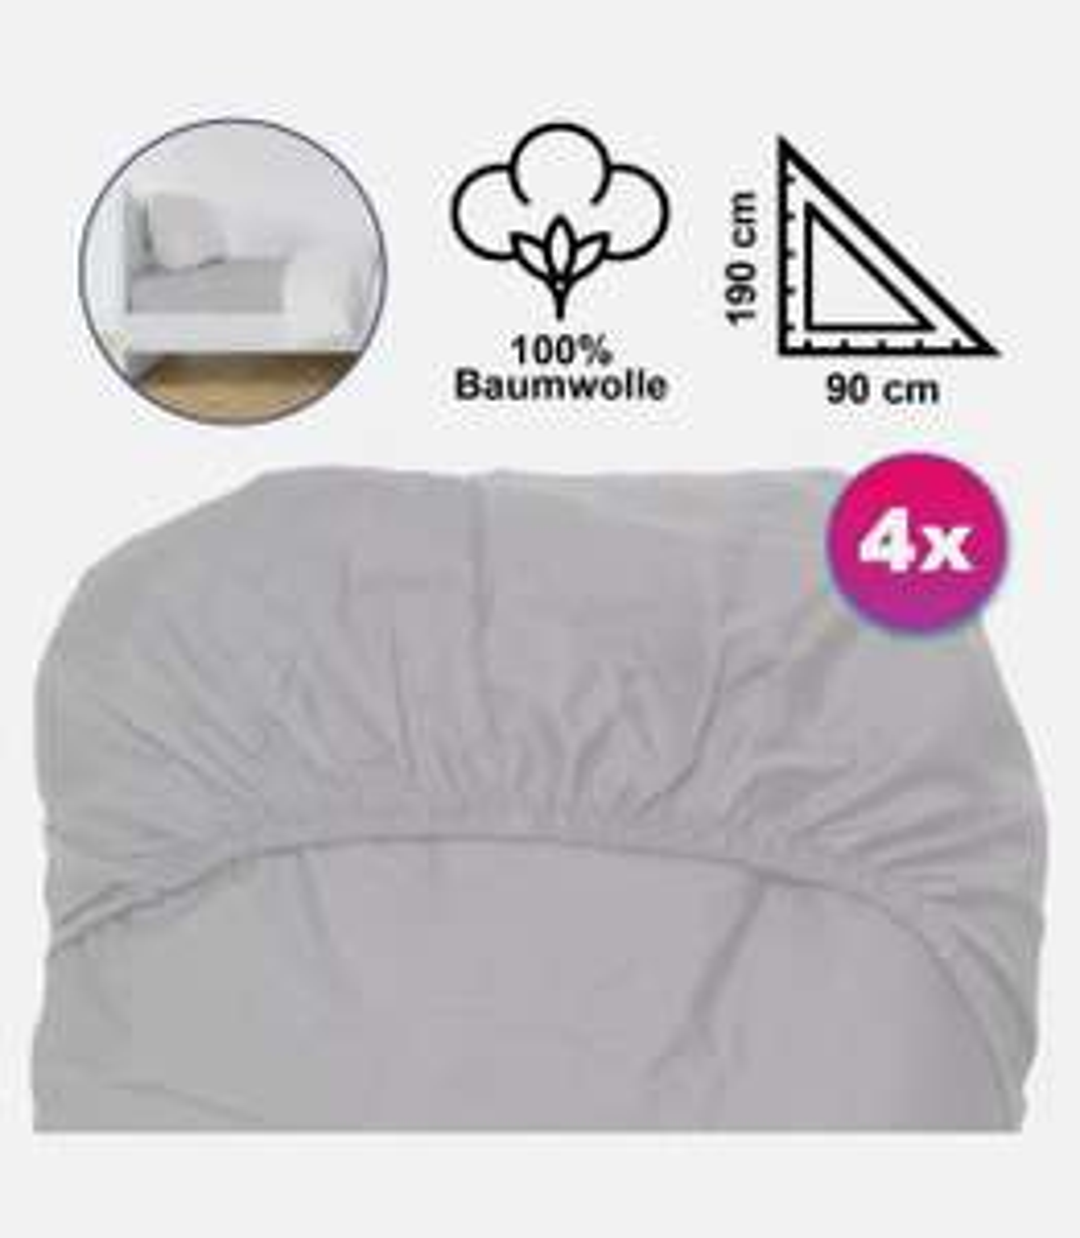 4x Spannbetttücher Grau 100% Baumwolle Bettlaken Bezug Gummizug 90x190/200cm Jersey